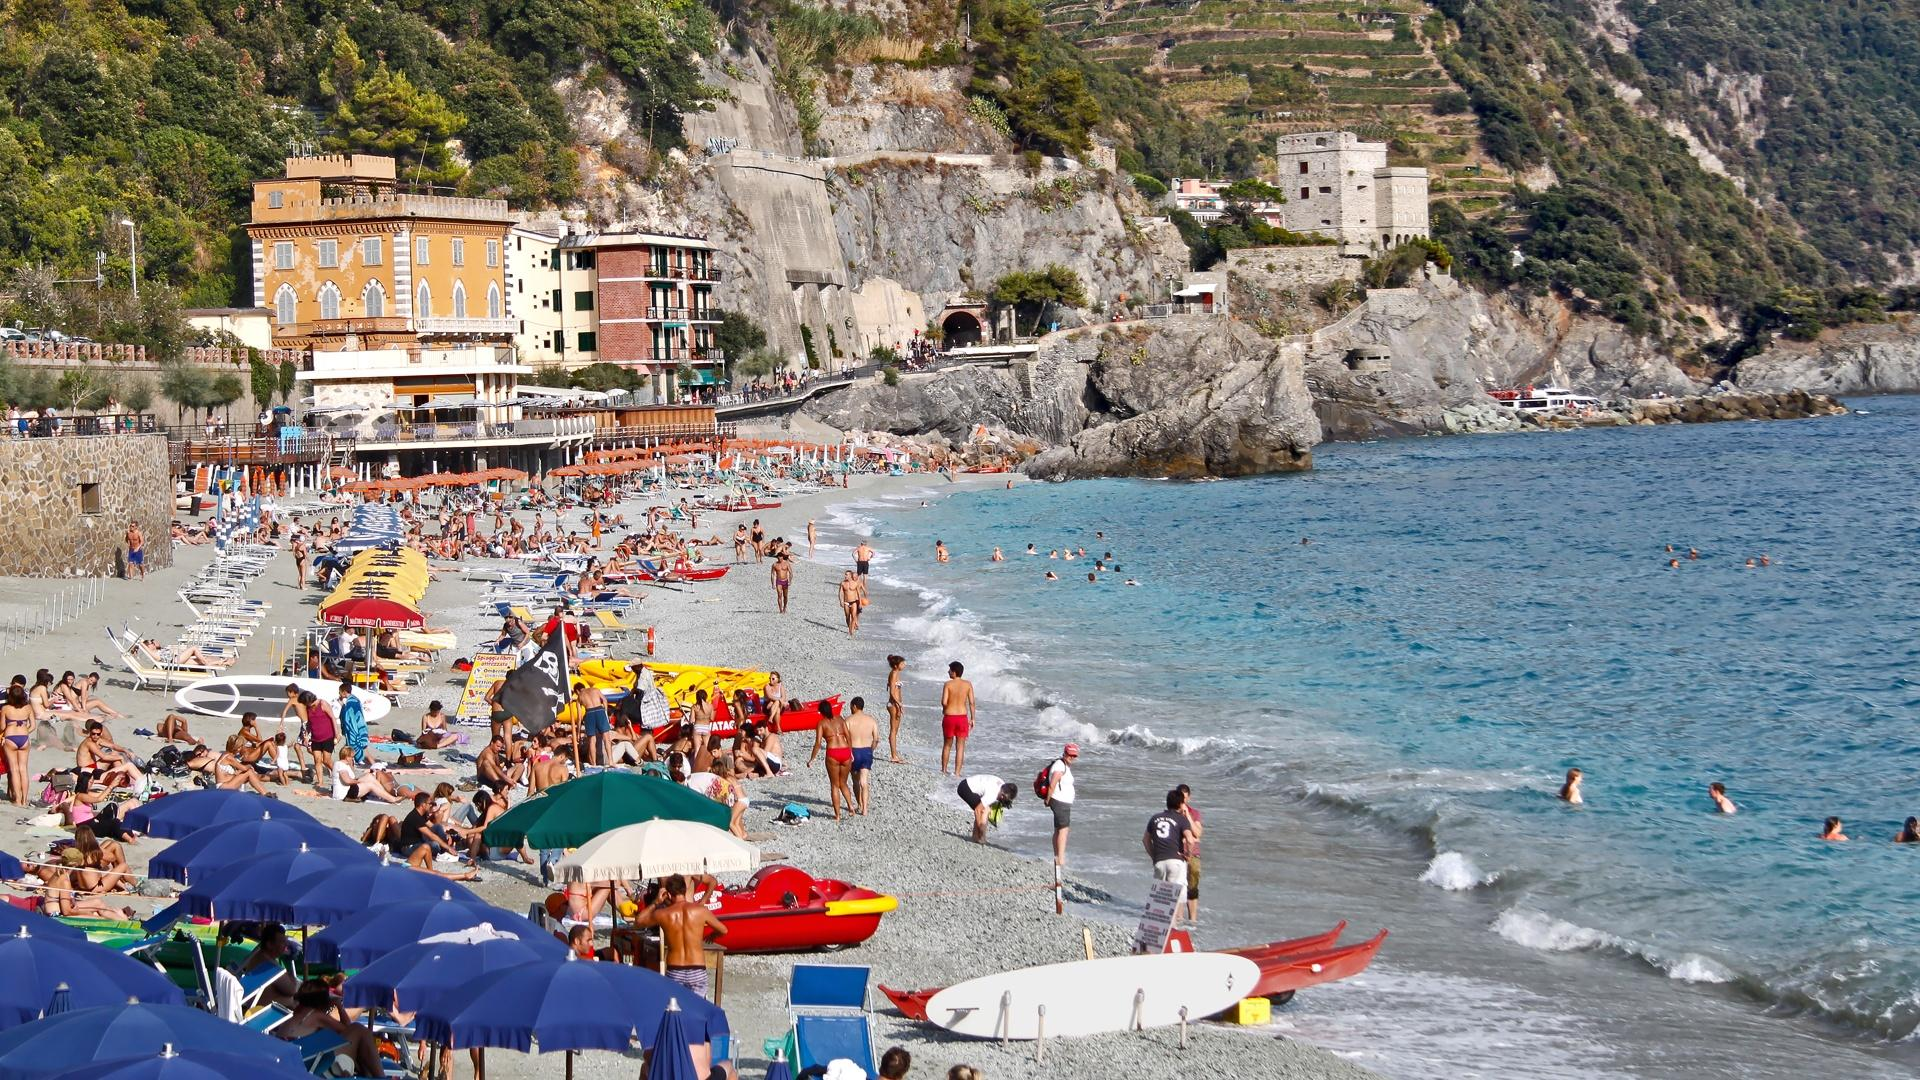 Monterosso Al Mare Italy Cinque Terre Resort Town Rick Steves Europe Pbs